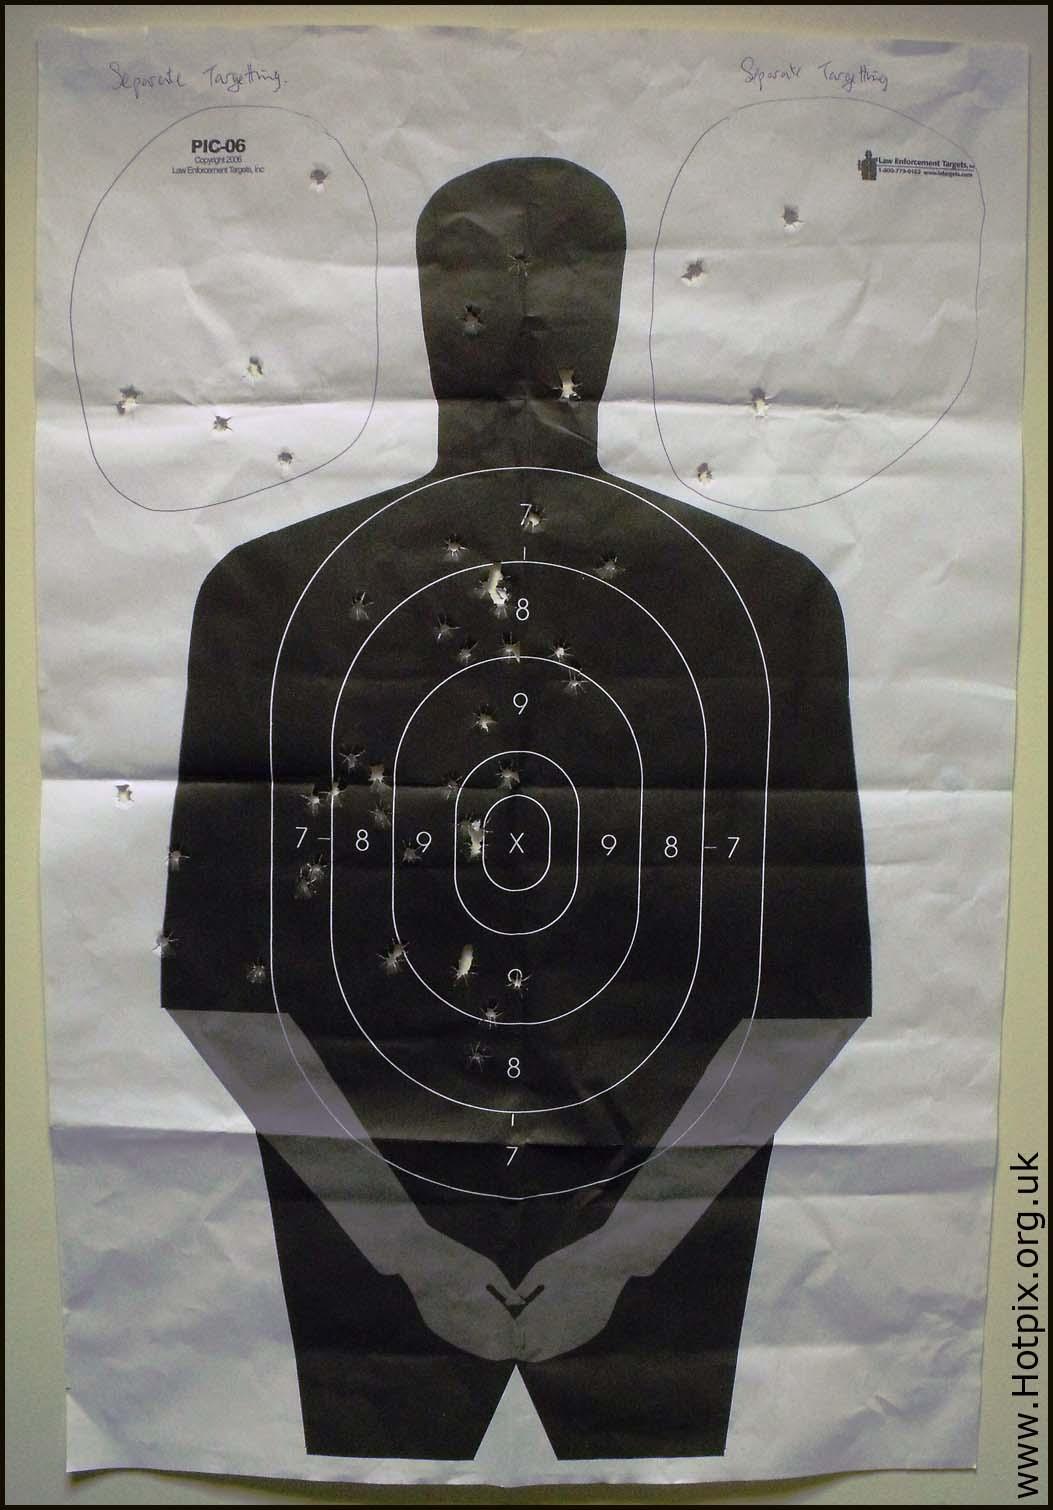 paper,target,law,enforcement,holes,used,glock,17,9mm,black,white,guns,people,death,fire,arm,firearm,dark,disturbia,stillife,stilllife,still,life,hotpix!